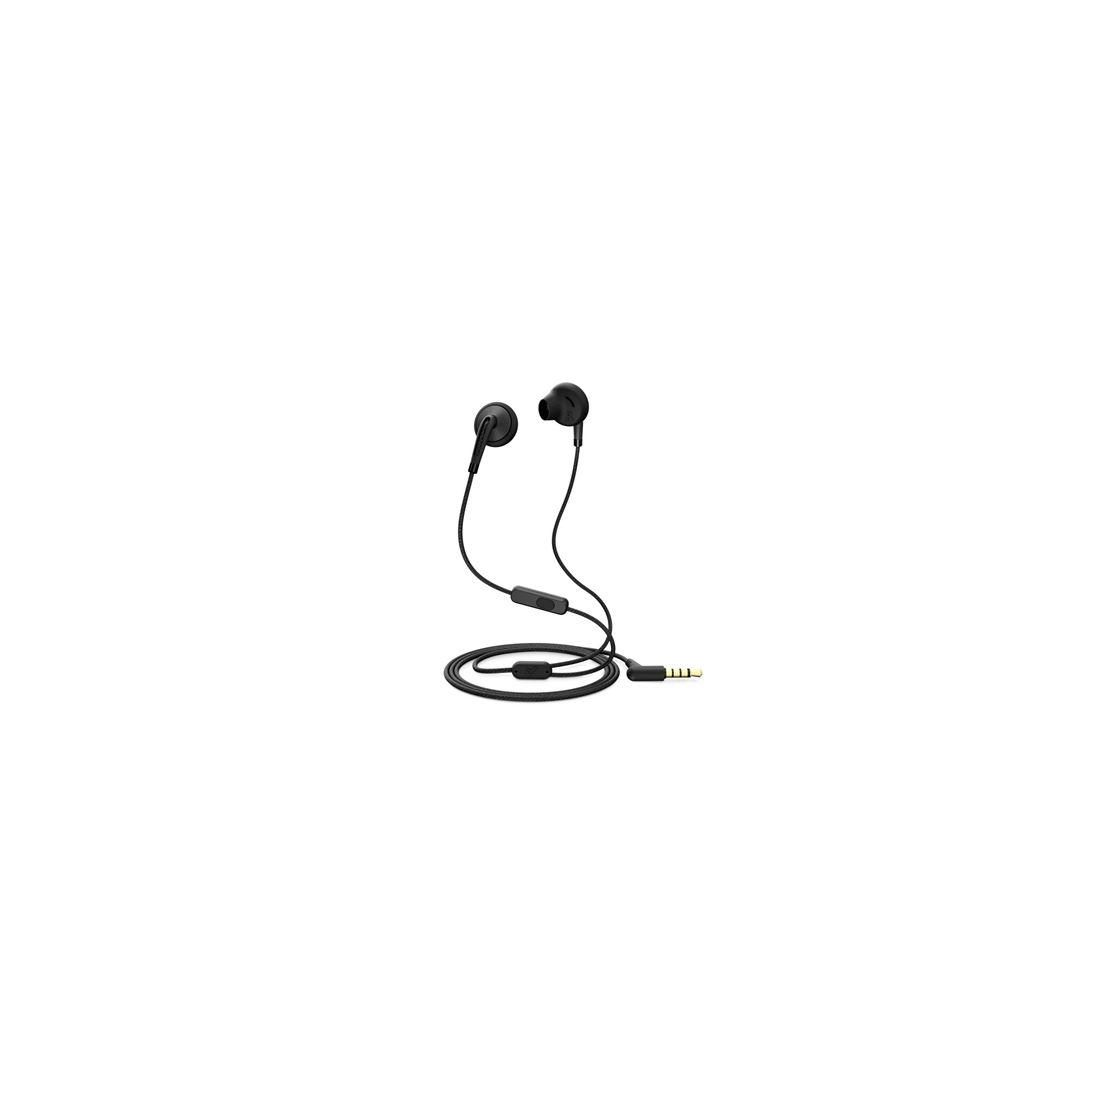 Energy Sistem AurMic In ear Style 2 Space